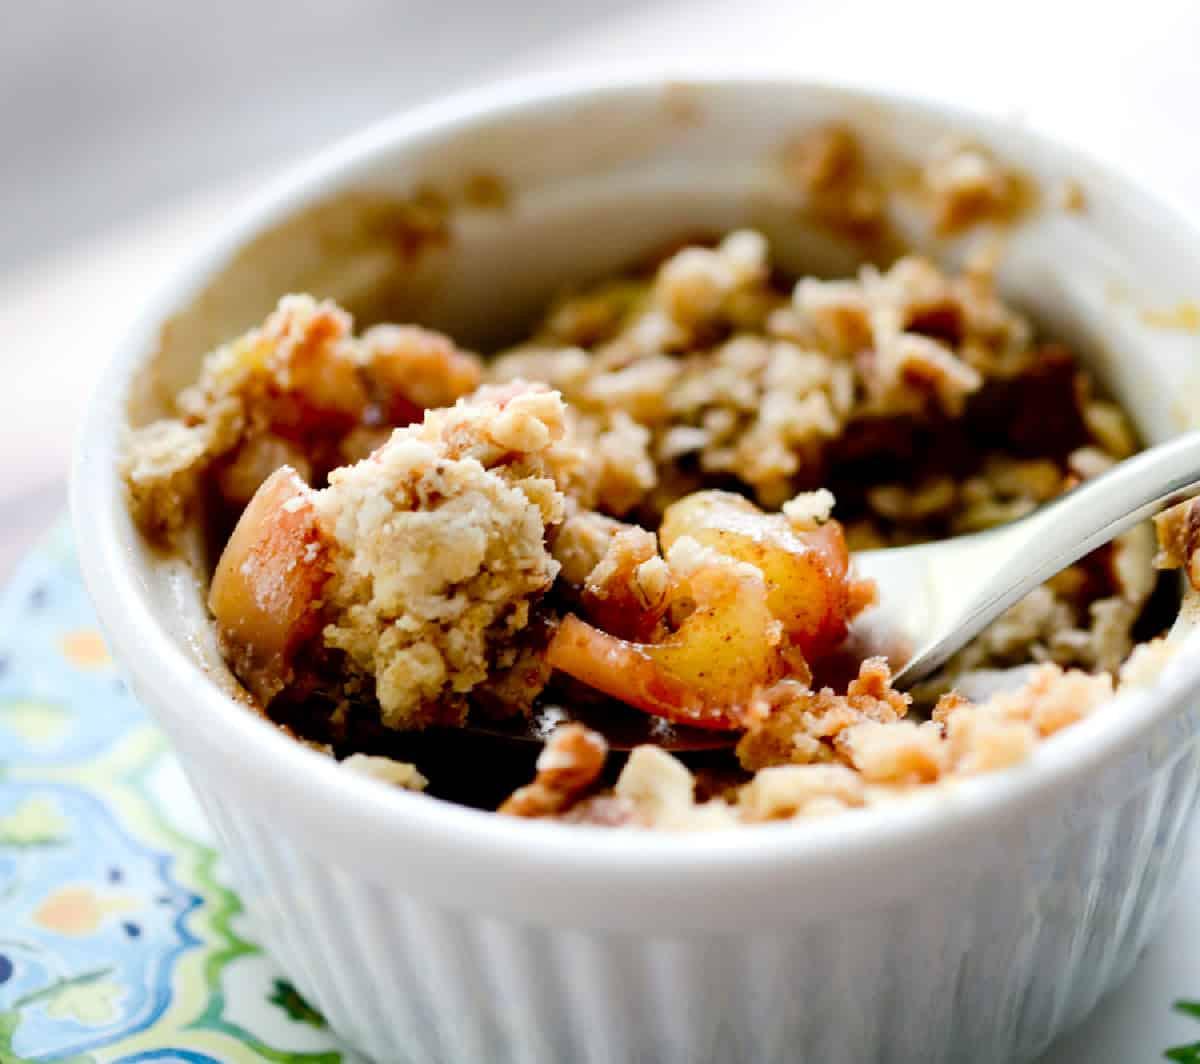 Microwave apple crisp dessert in small white ramekin with fork.